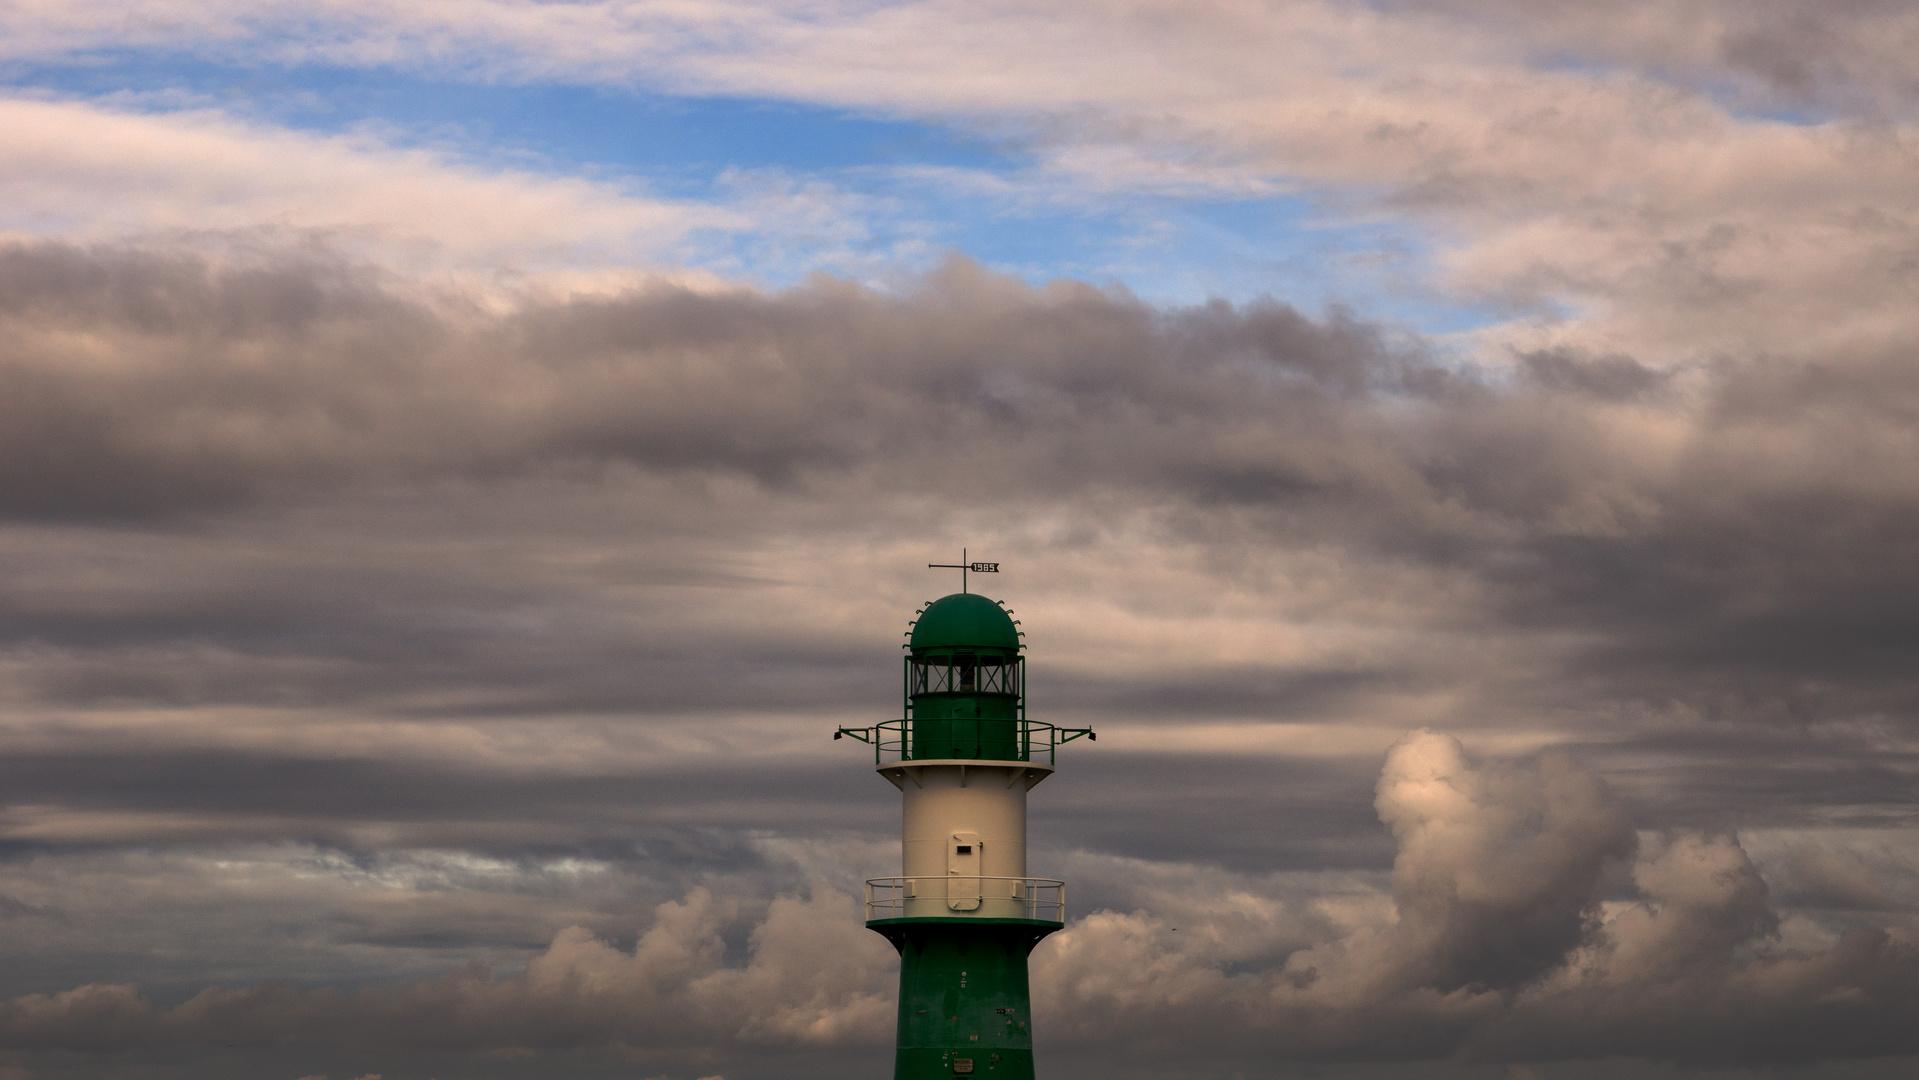 Leuchturm Steuerbord